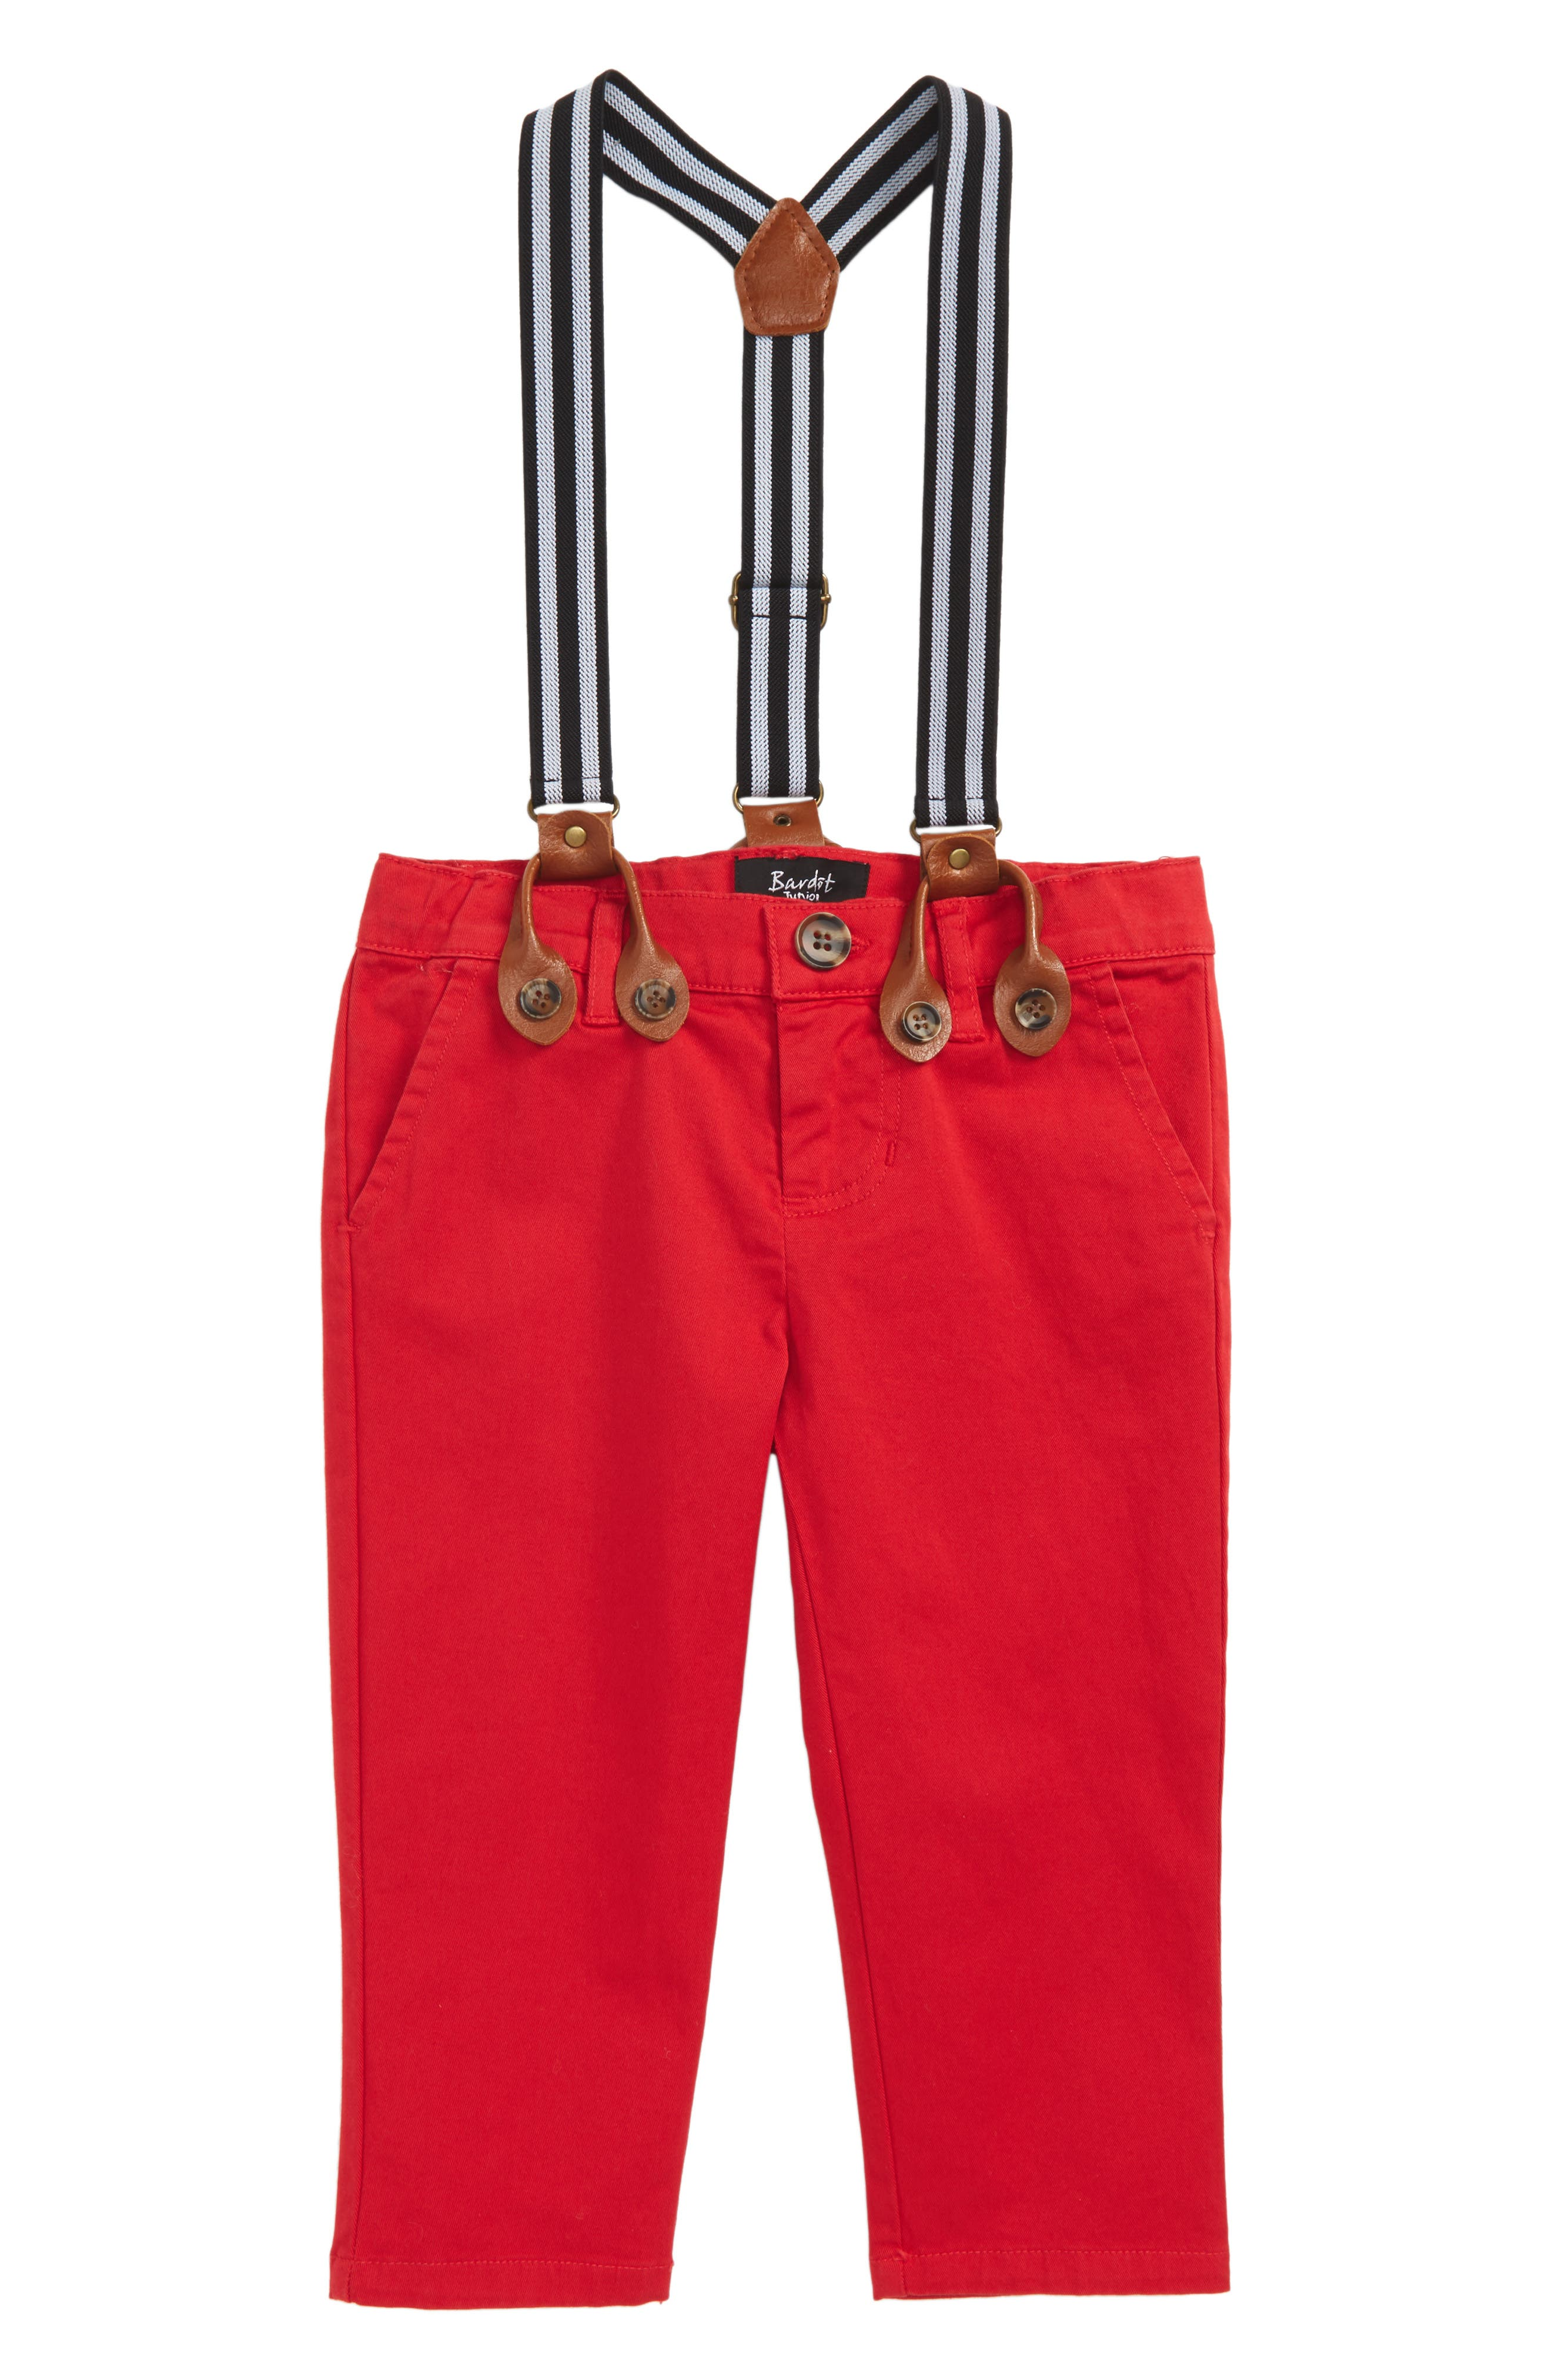 Chinos & Suspenders Set,                             Main thumbnail 1, color,                             620